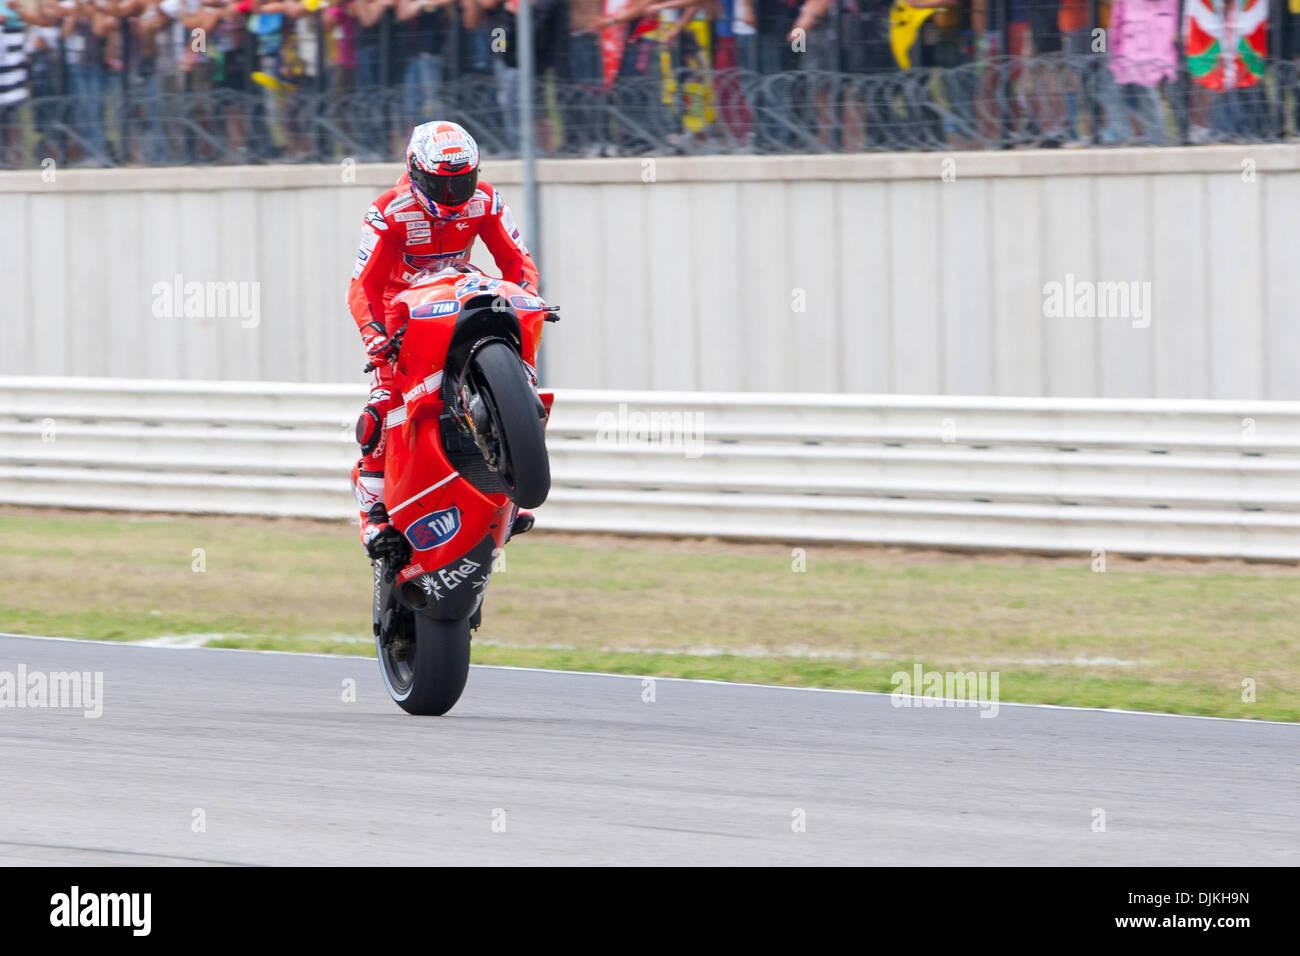 Sep. 07, 2010 - Misano Adriatico, Italy - Ducati rider Casey Stoner (USA #27) celebrate with a wheelie the 5th place of the San Marino GP in Misano Adriatico, Italy. (Credit Image: © Andrea Ranalli/Southcreek Global/ZUMApress.com) - Stock Image